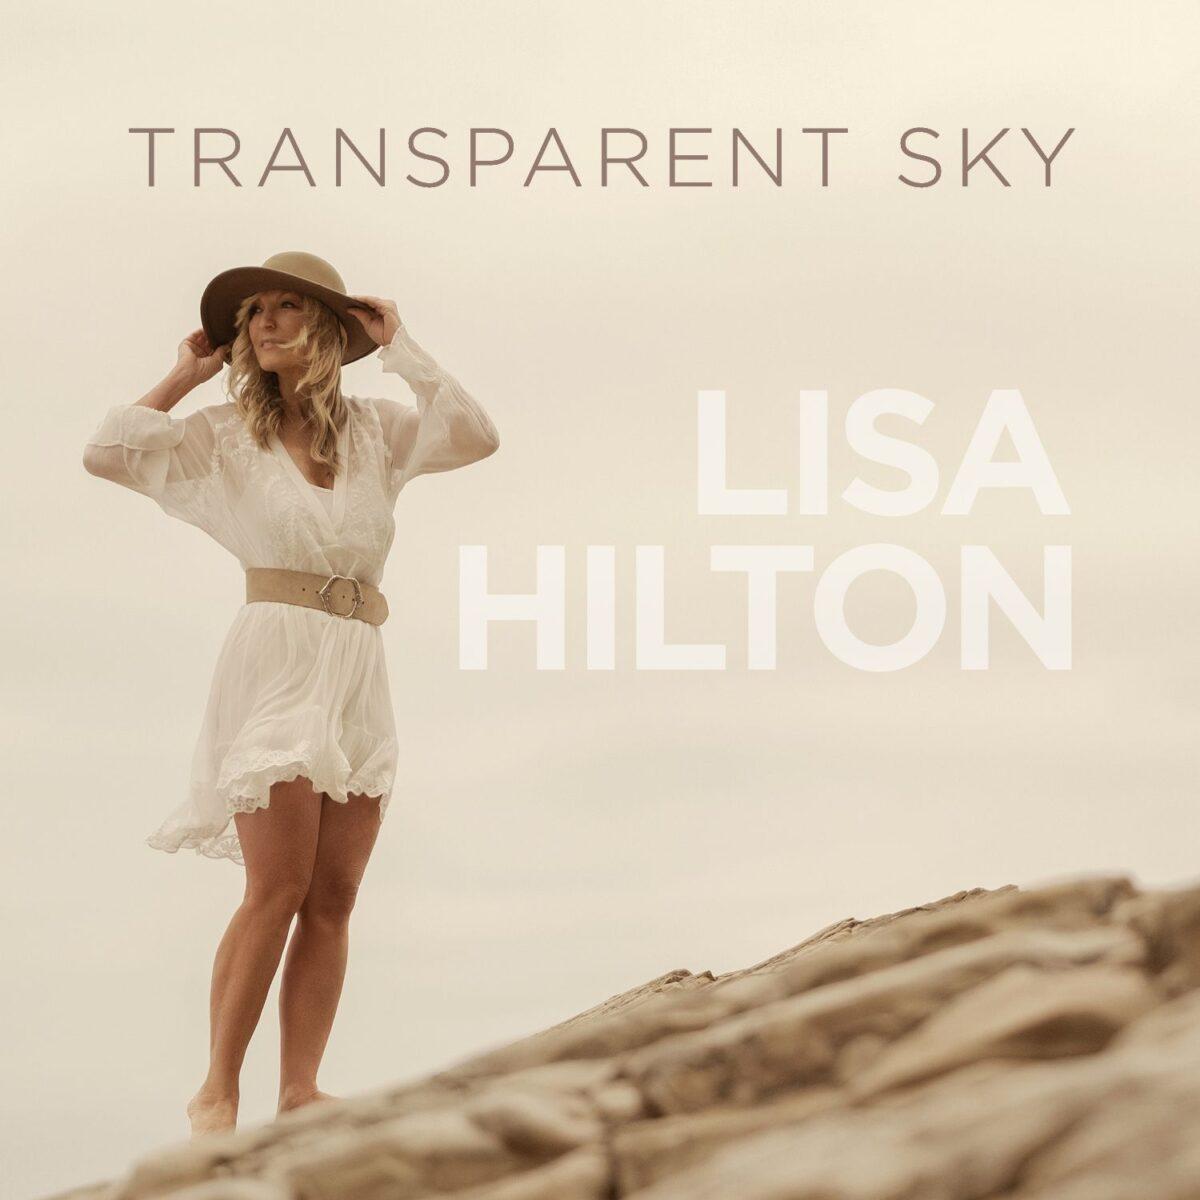 Lisa Hilton Transparent Sky